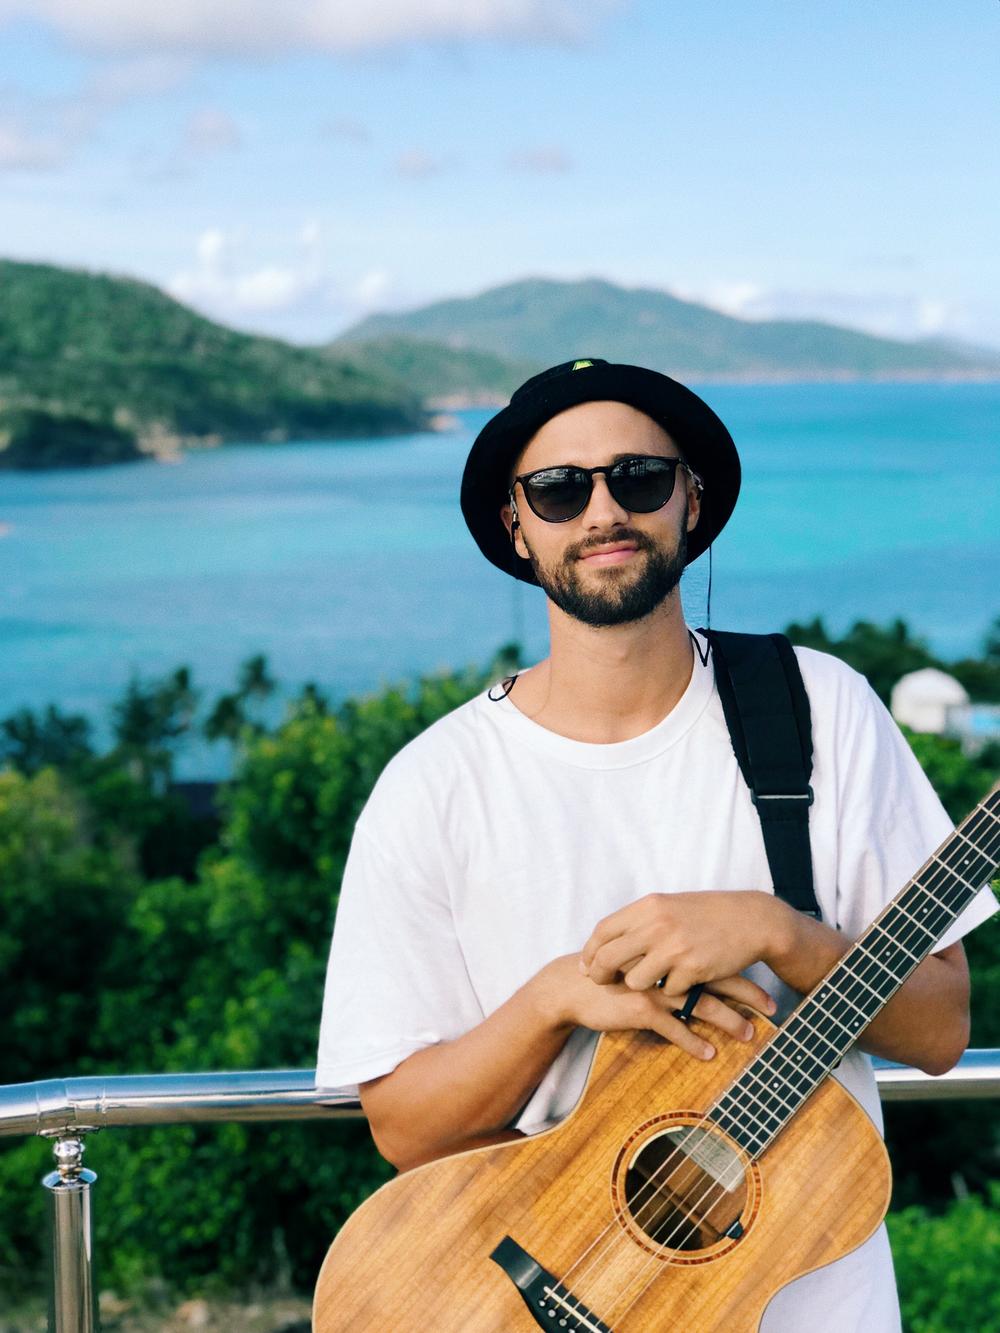 crotti-mark-crotti-hamilton-island-one-tree-hill-acoustic-live-music-march-2019.png